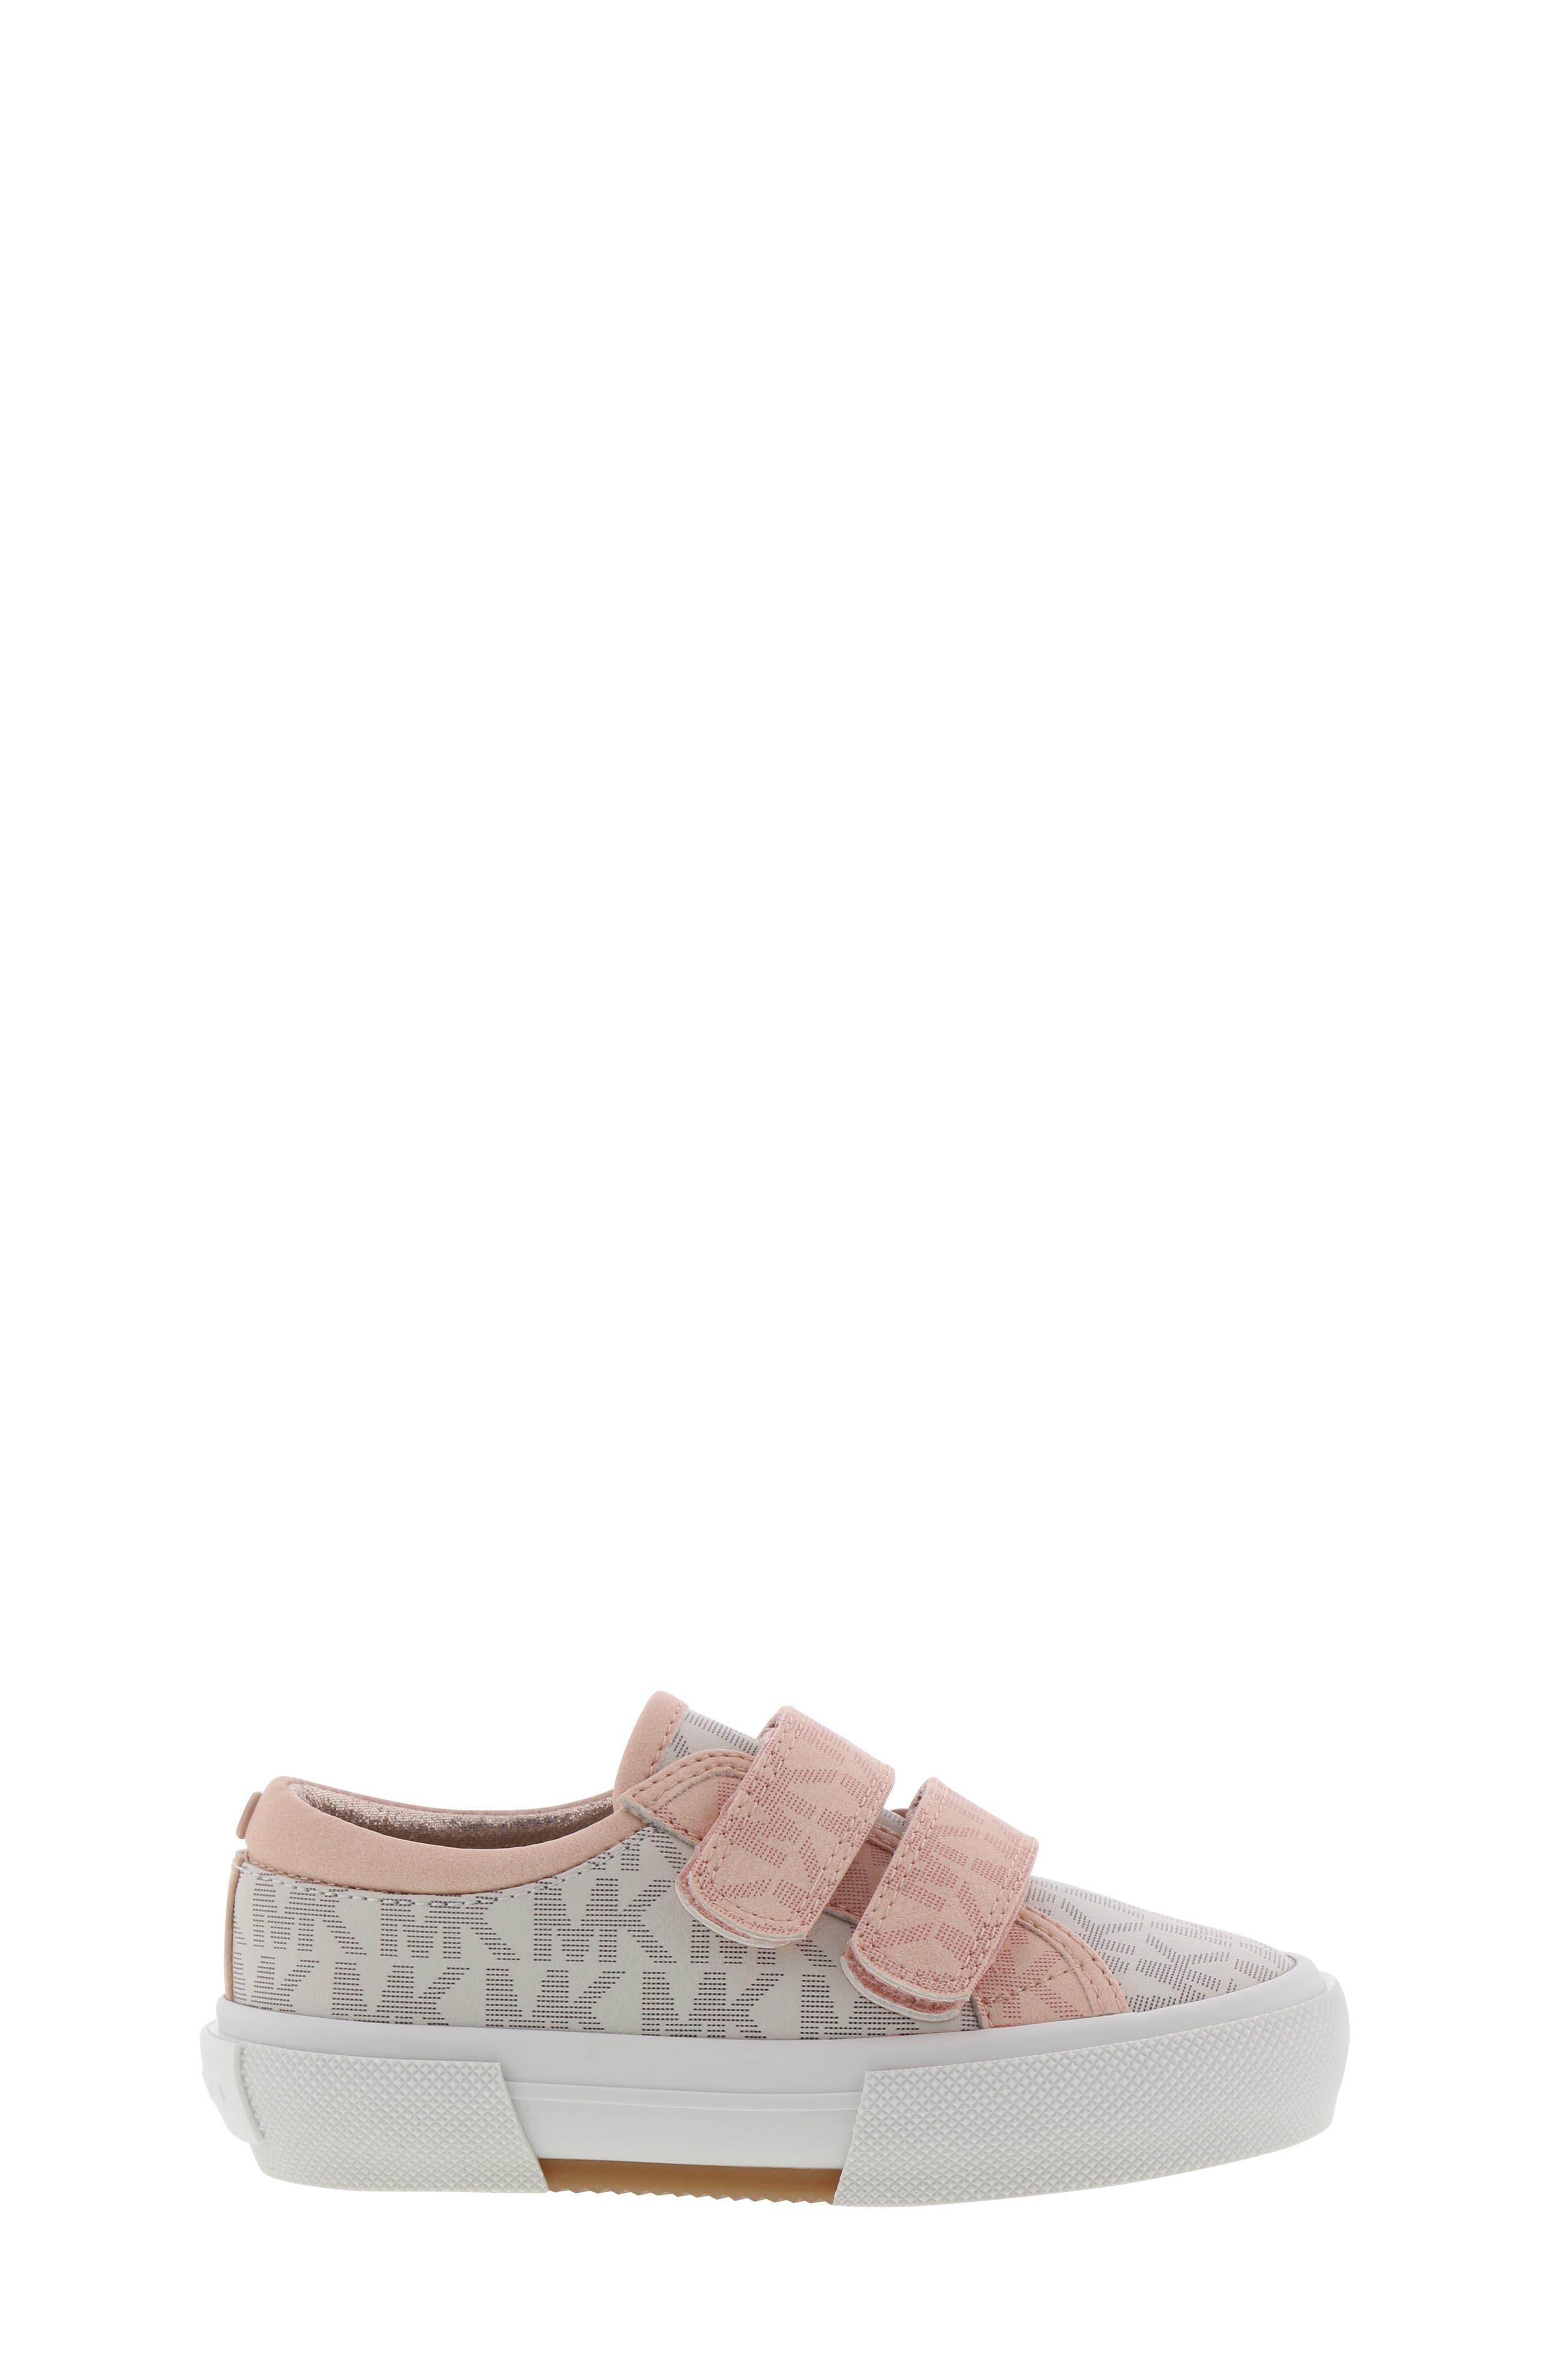 Ima Double Platform Sneaker,                             Alternate thumbnail 3, color,                             VANILLA/ BLUSH